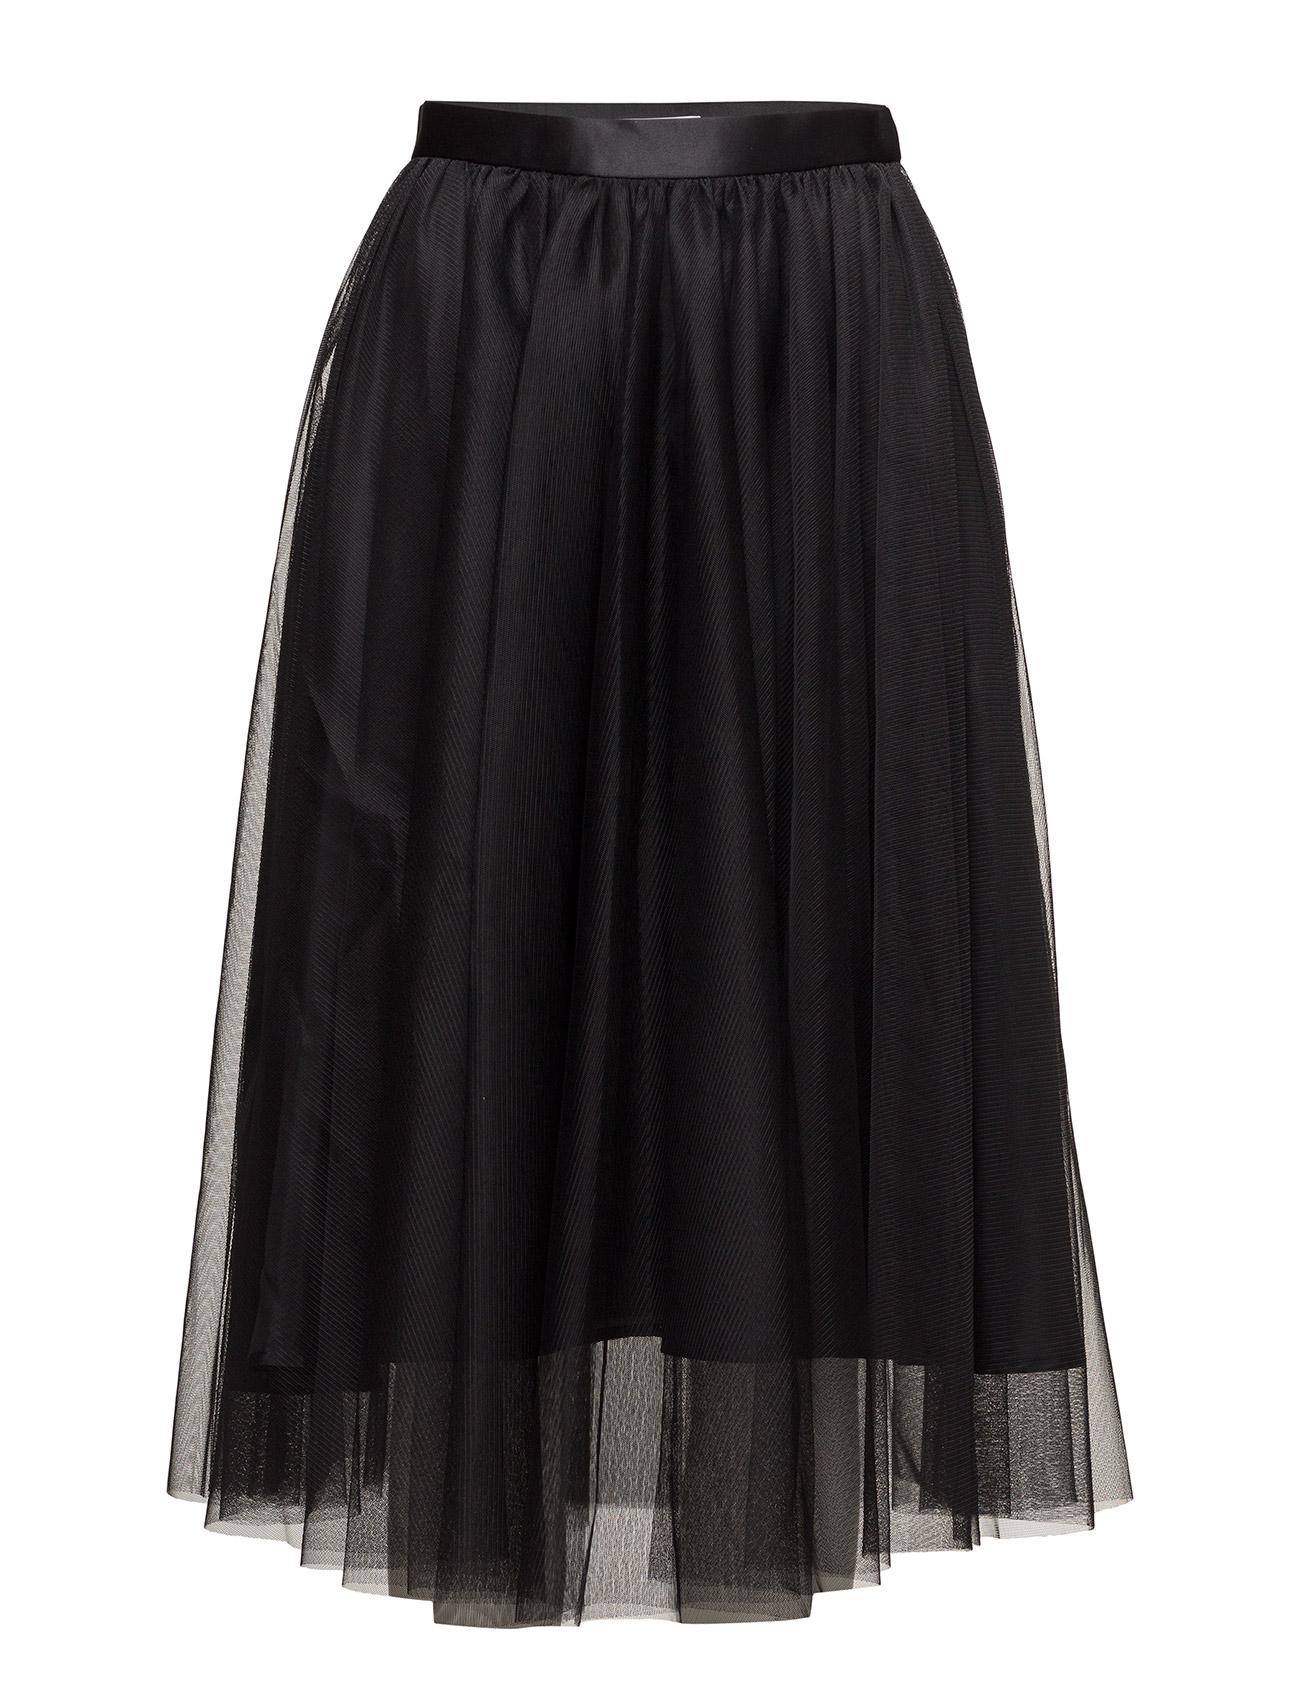 ida sjã¶stedt Flawless skirt på boozt.com dk